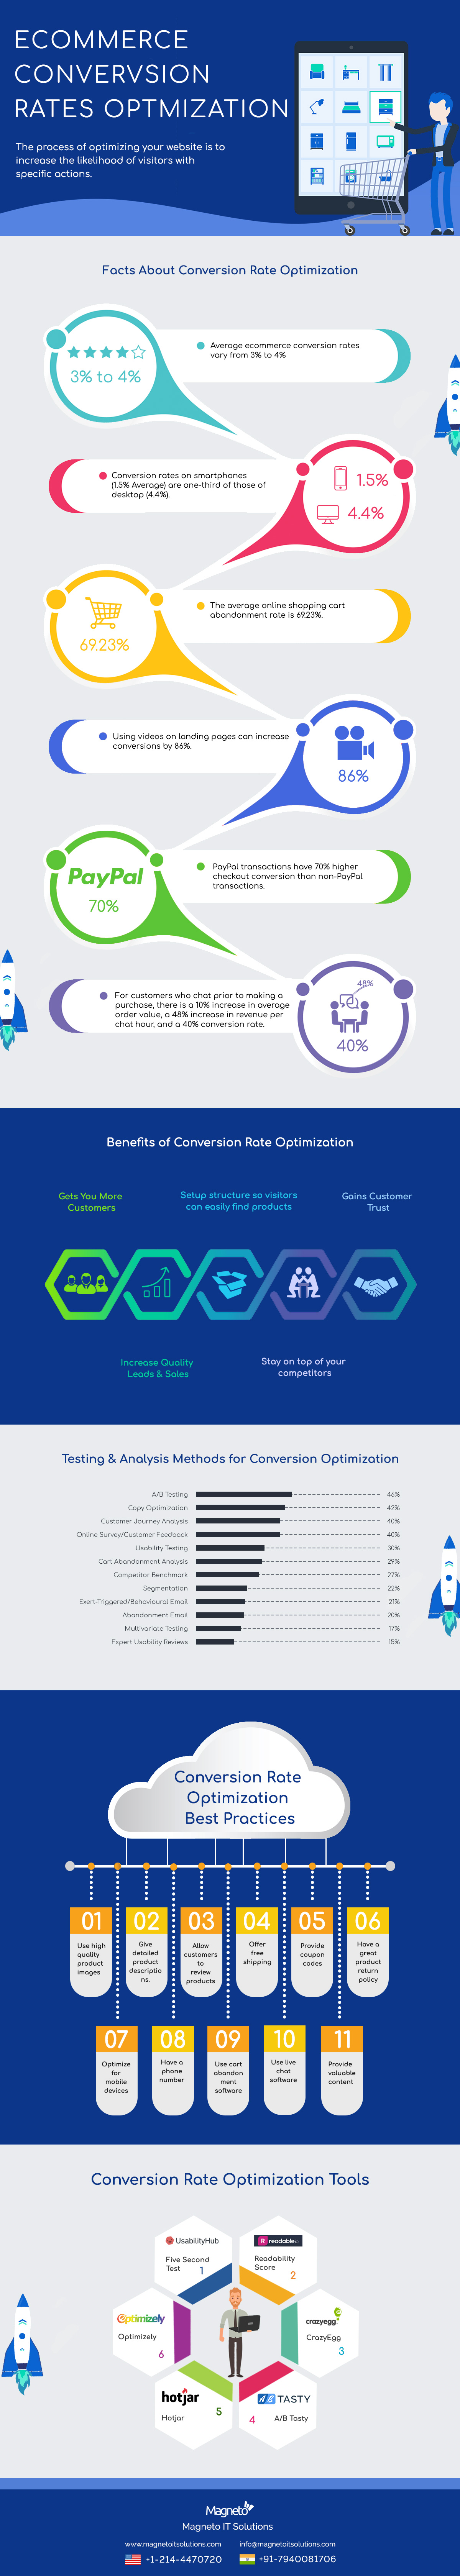 eCommerce-Conversion-Rates-Optmization